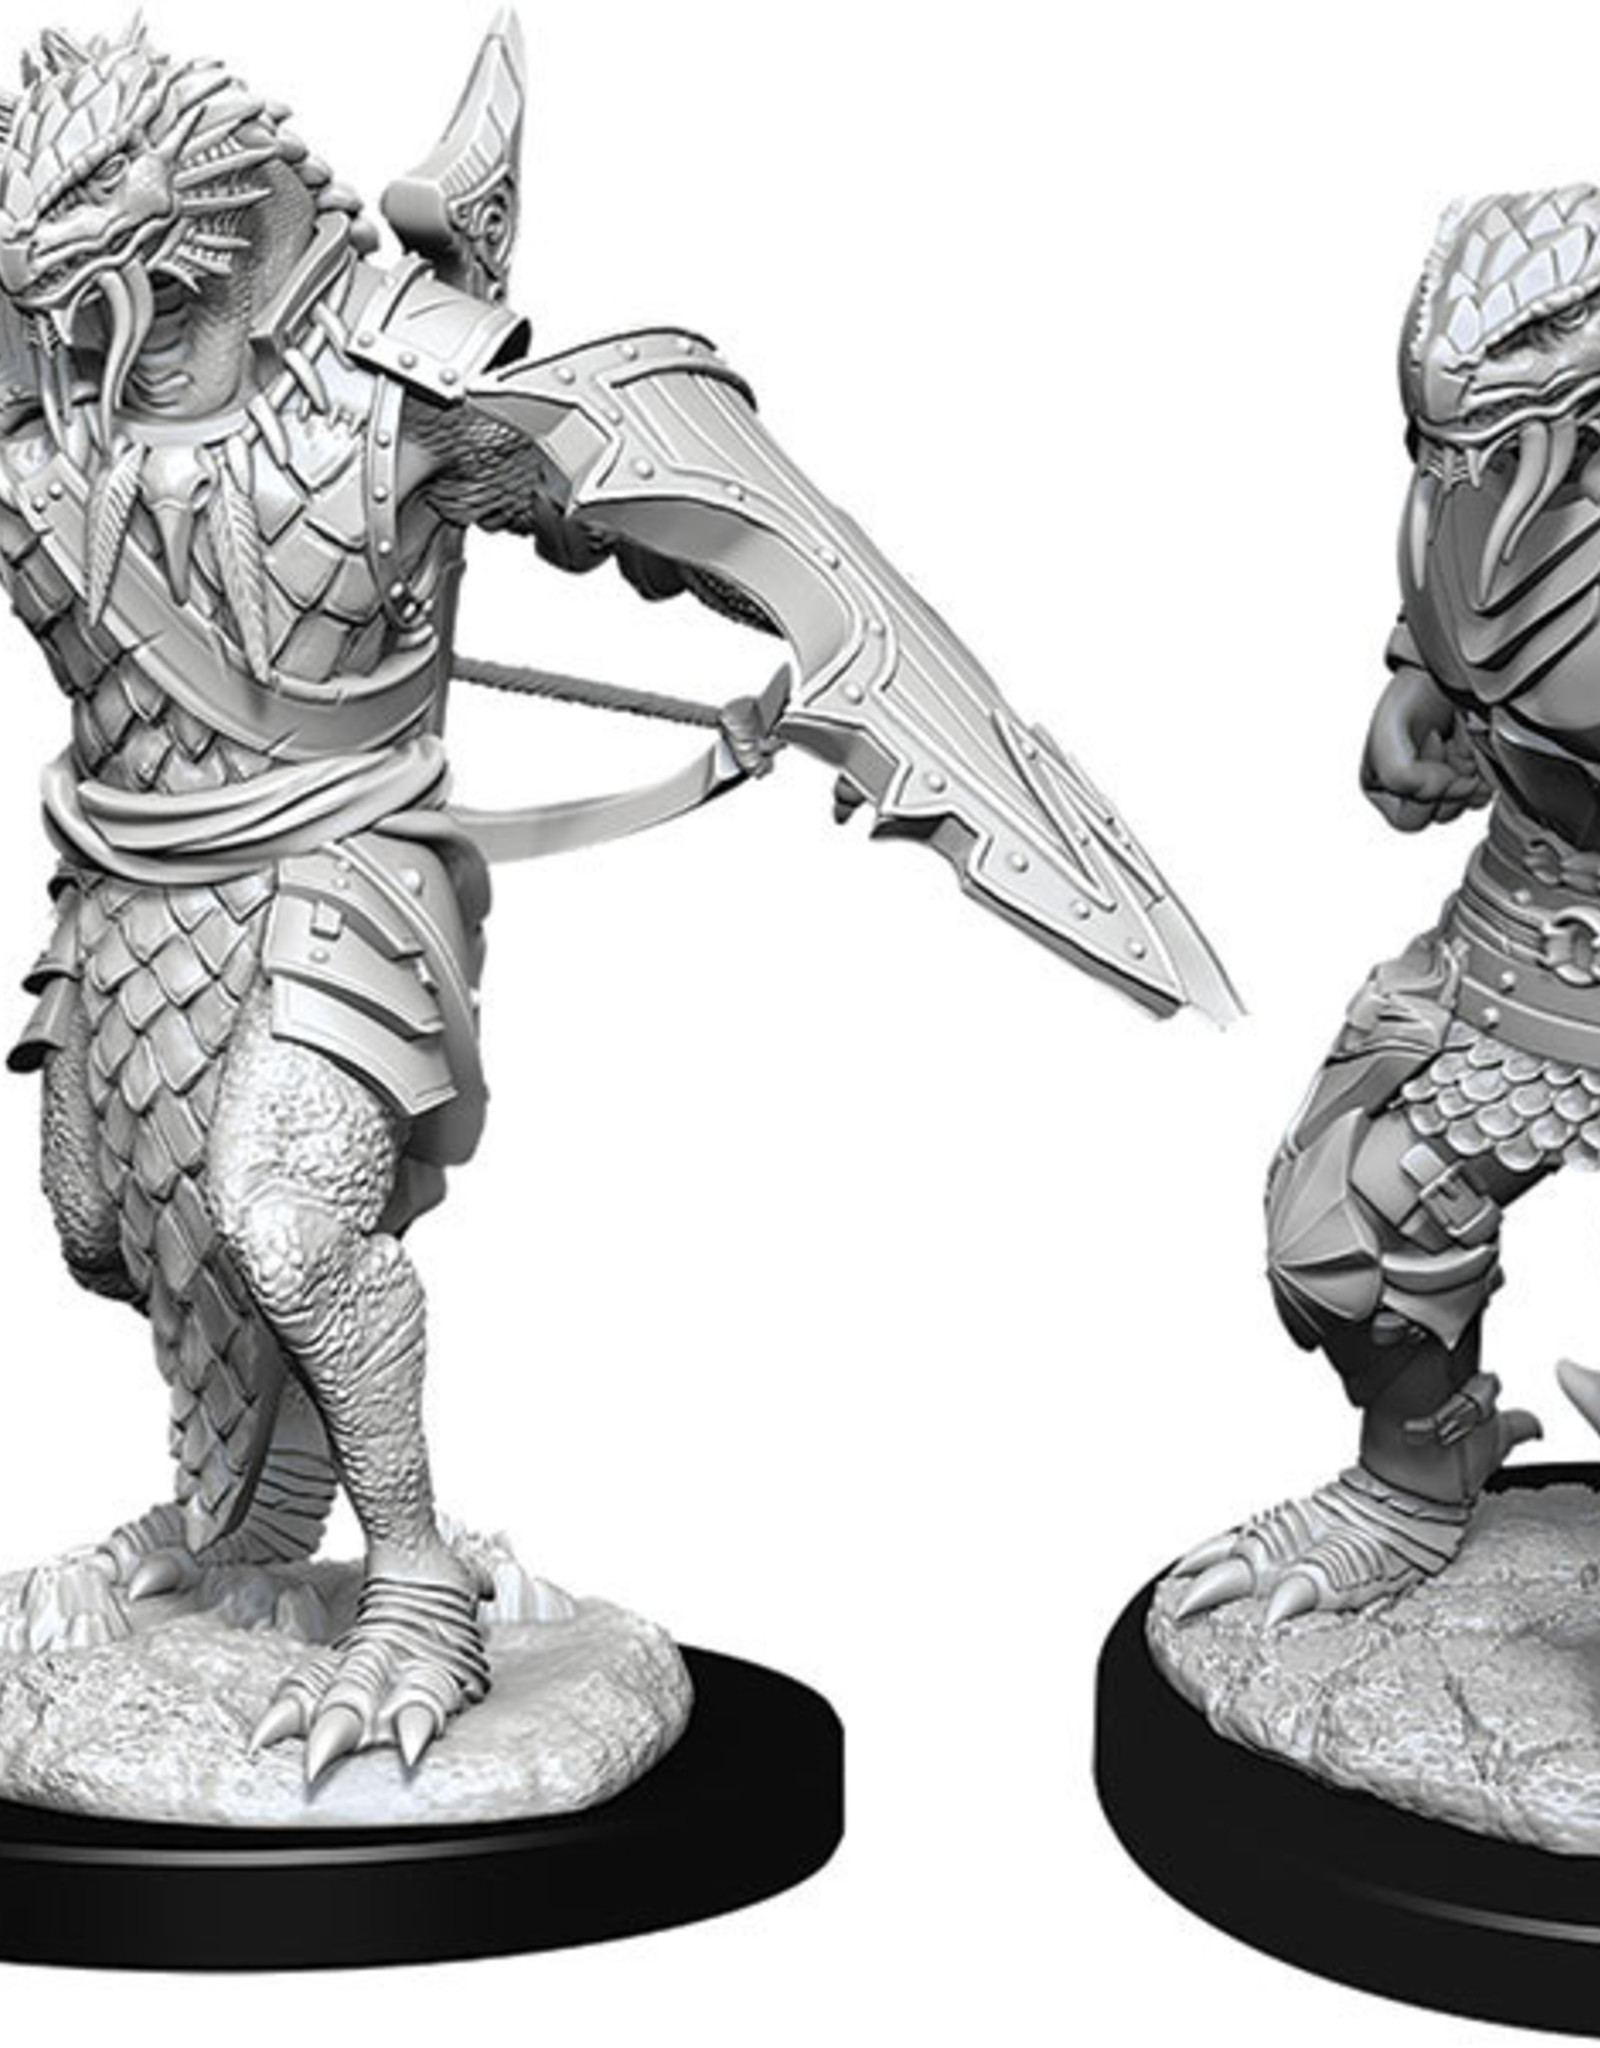 Dungeons & Dragons Nolzur`s Marvelous Unpainted Miniatures: W11 Male Dragonborn Paladin